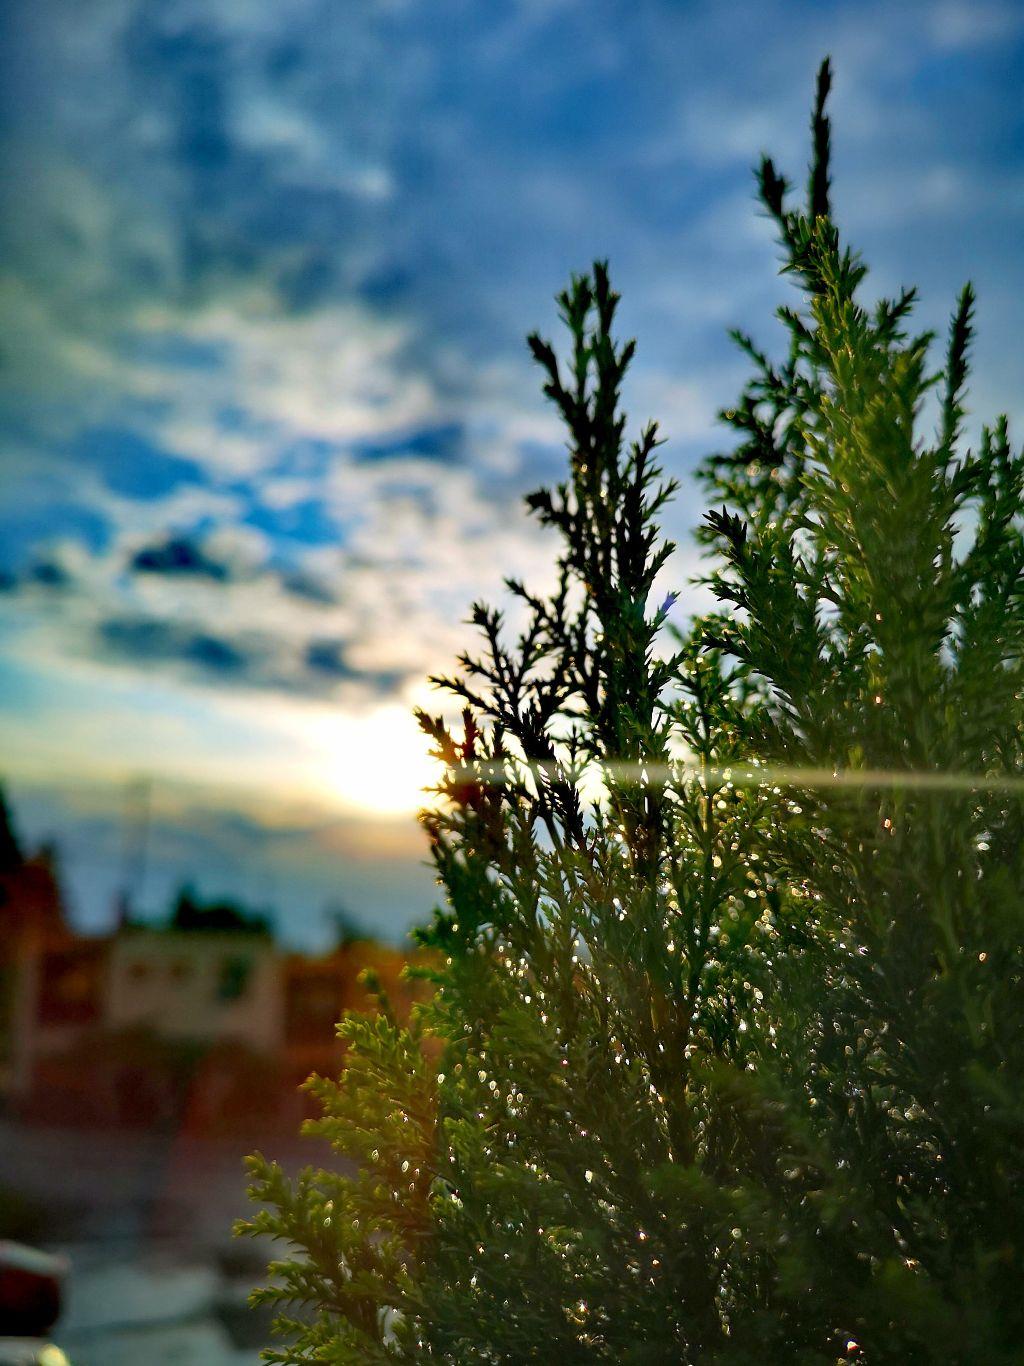 #sunshine #sunset #tree #colorful #rayoflight #clouds #cloudysky